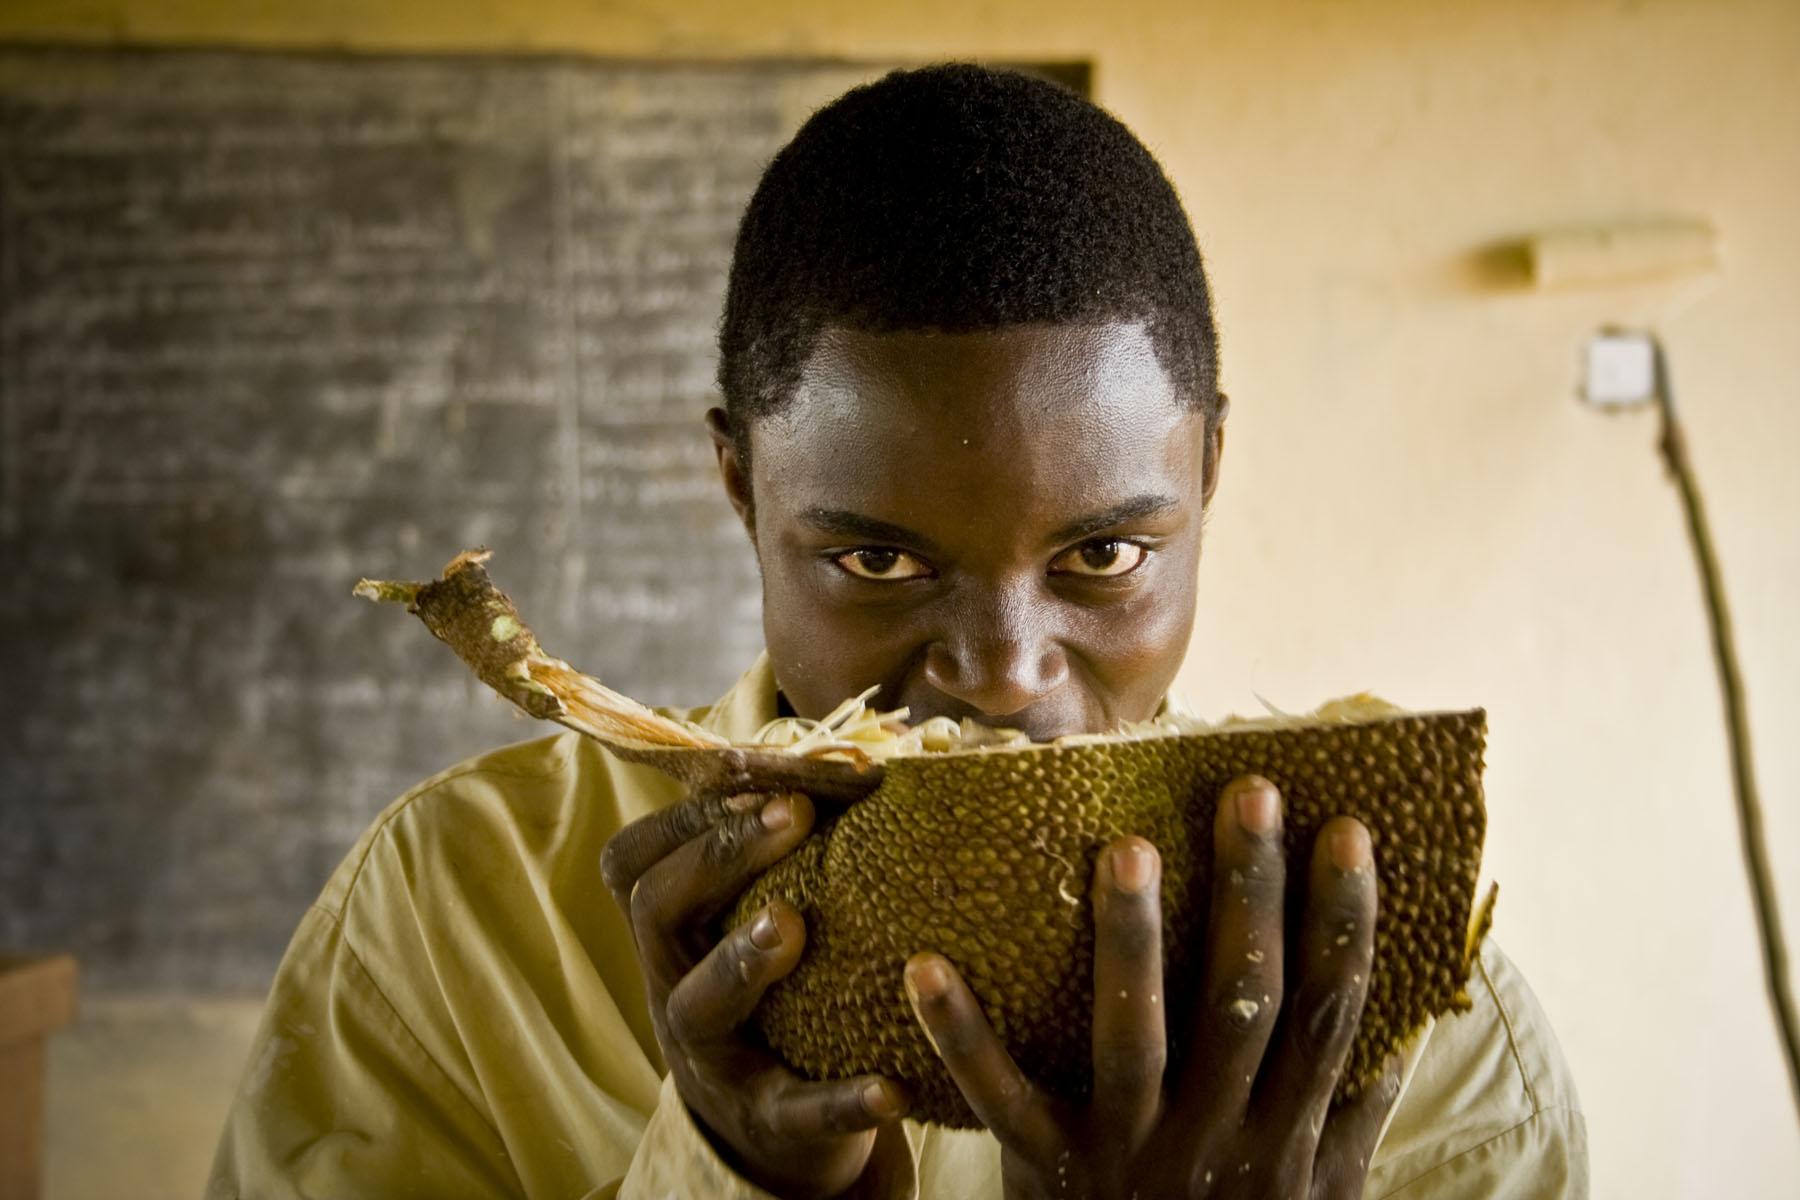 Thomas bites into a fresh jackfruit during his painting break (Nantwalla village, central Uganda)